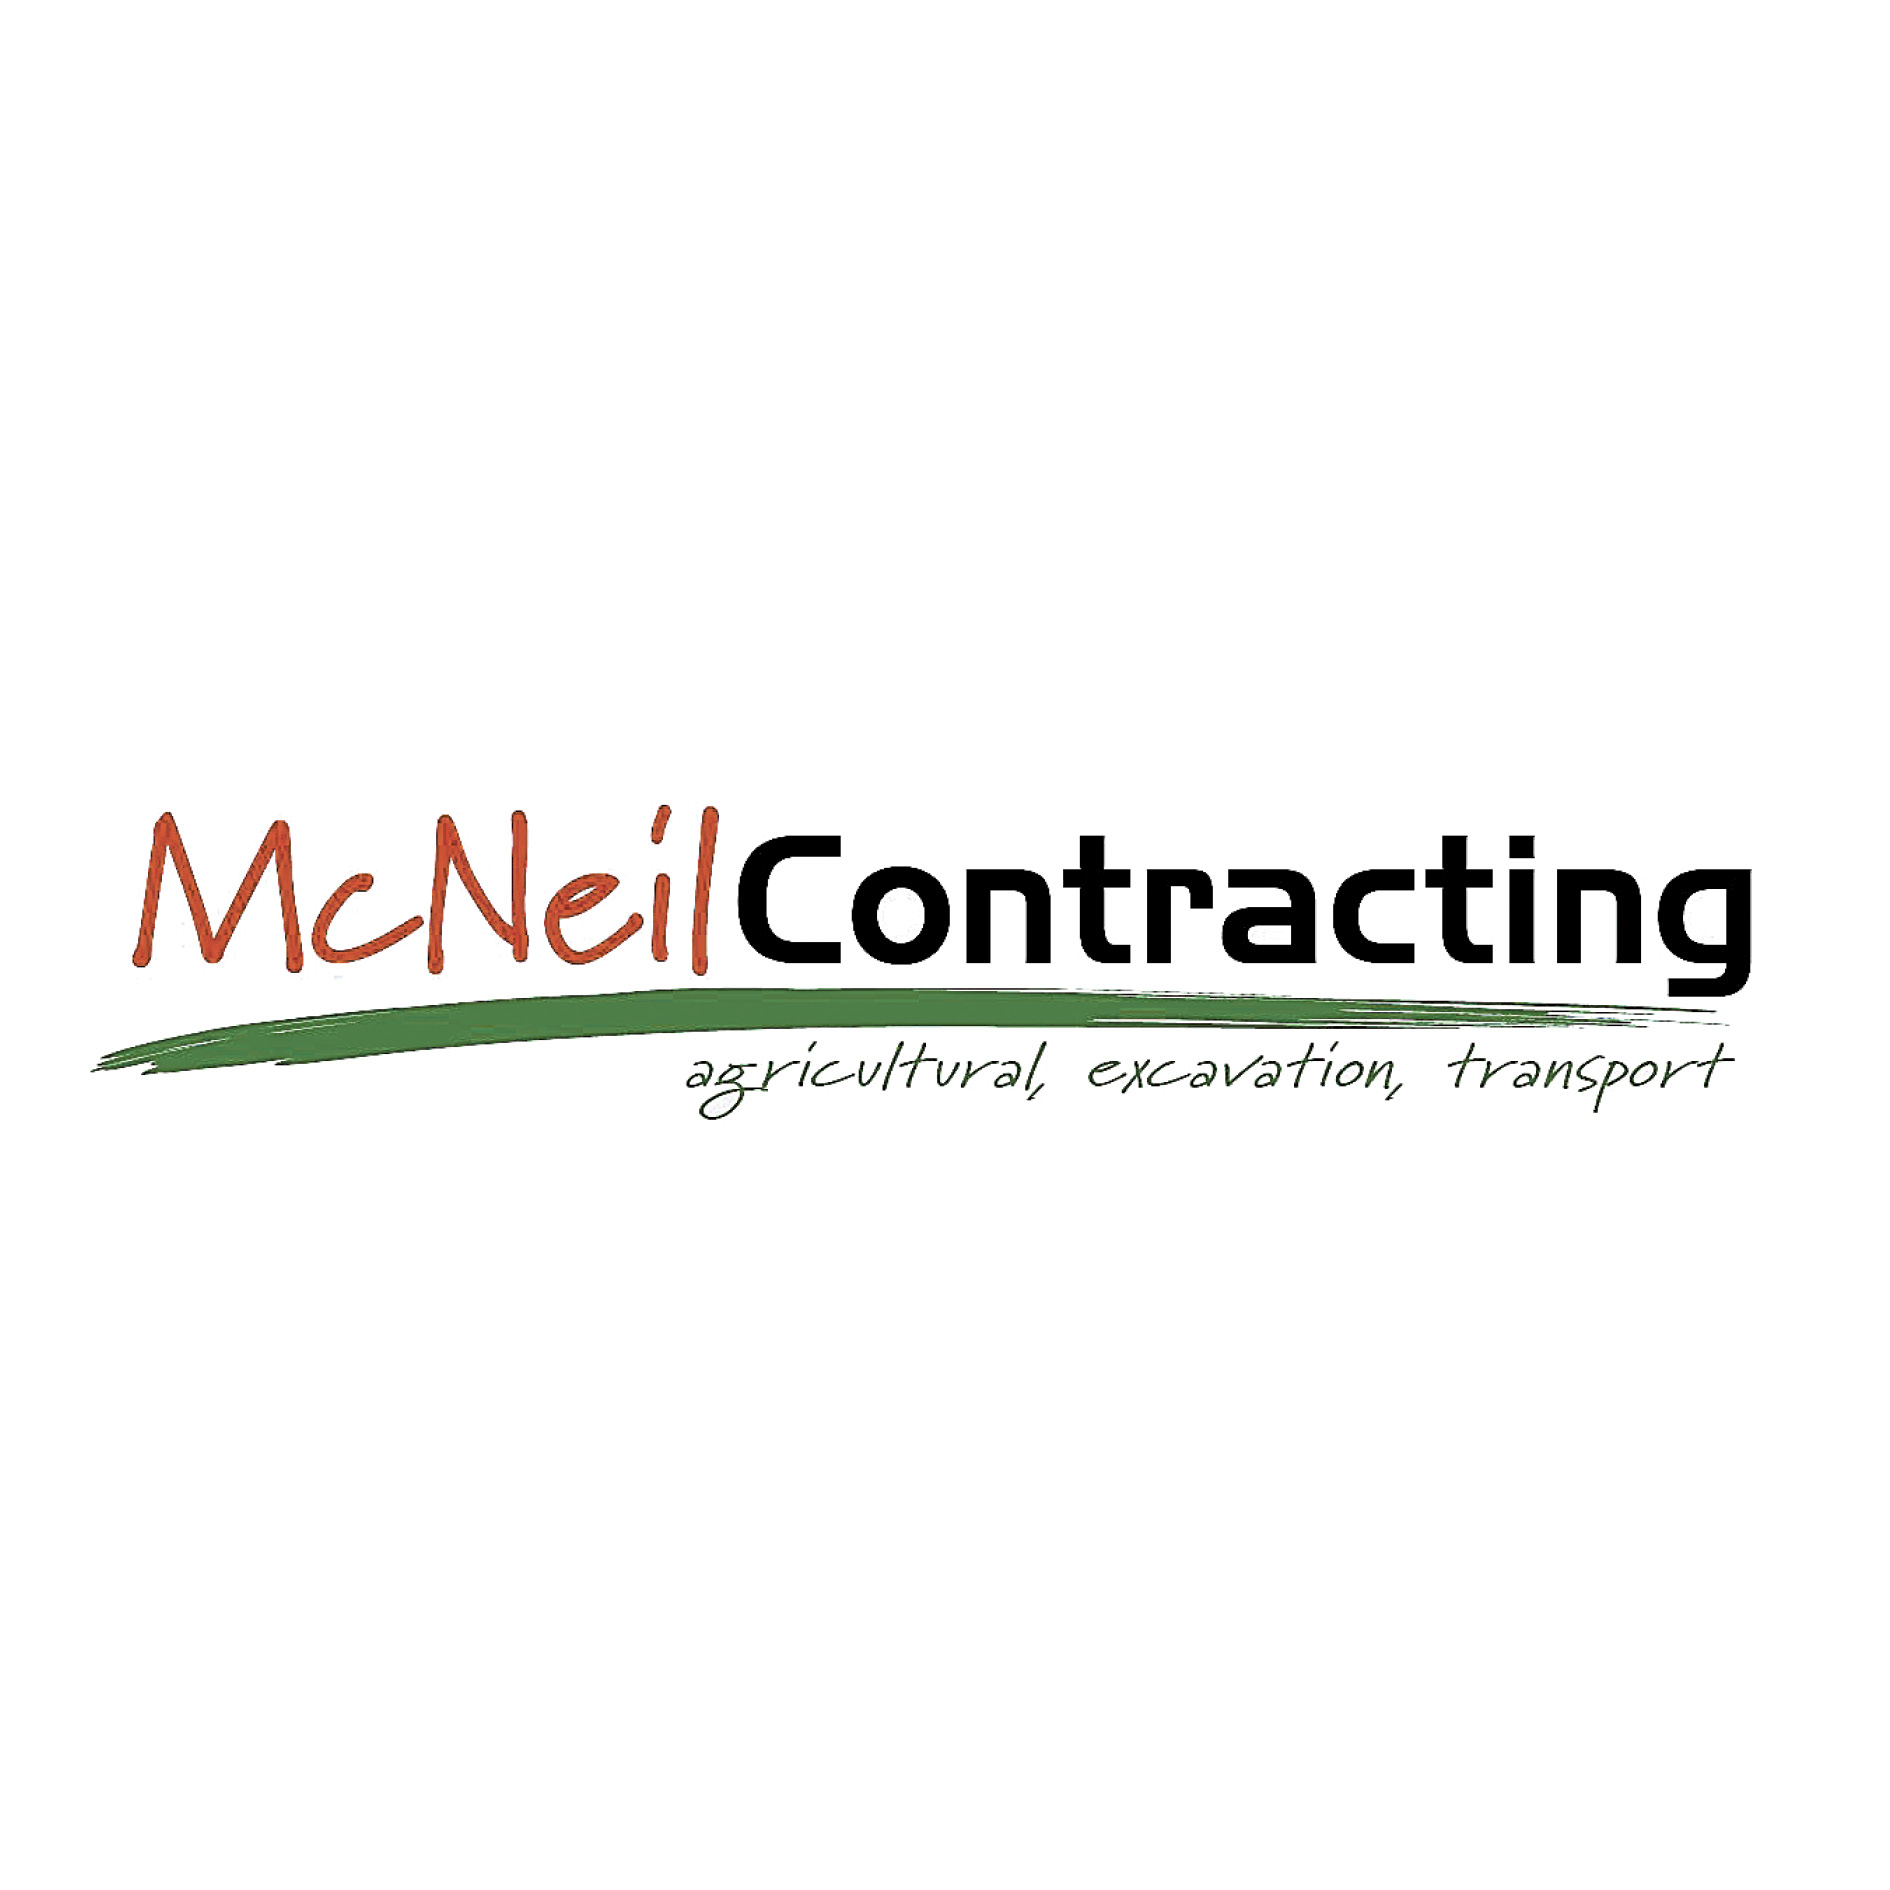 McNeil Contracting.jpg